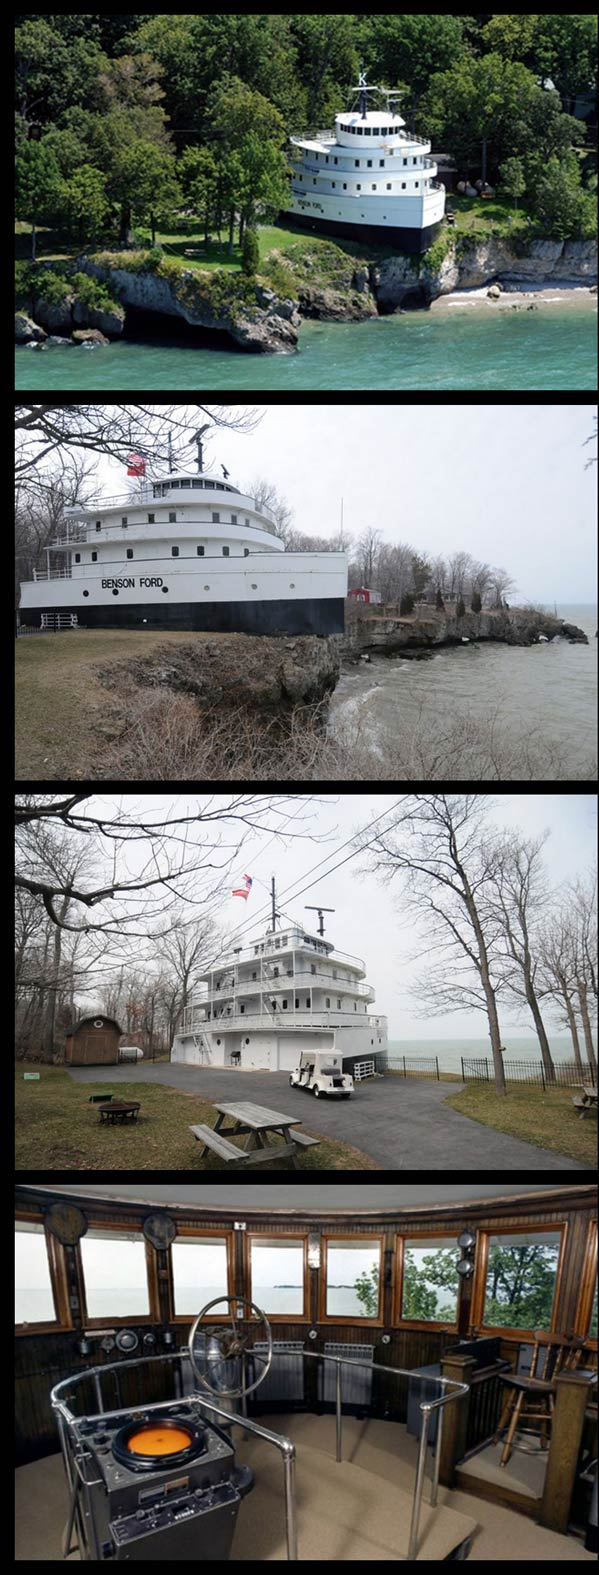 Benson Ford House Benson Ford Shiphouse Kapal Yang Kini Menjadi Sebuah Rumah 24